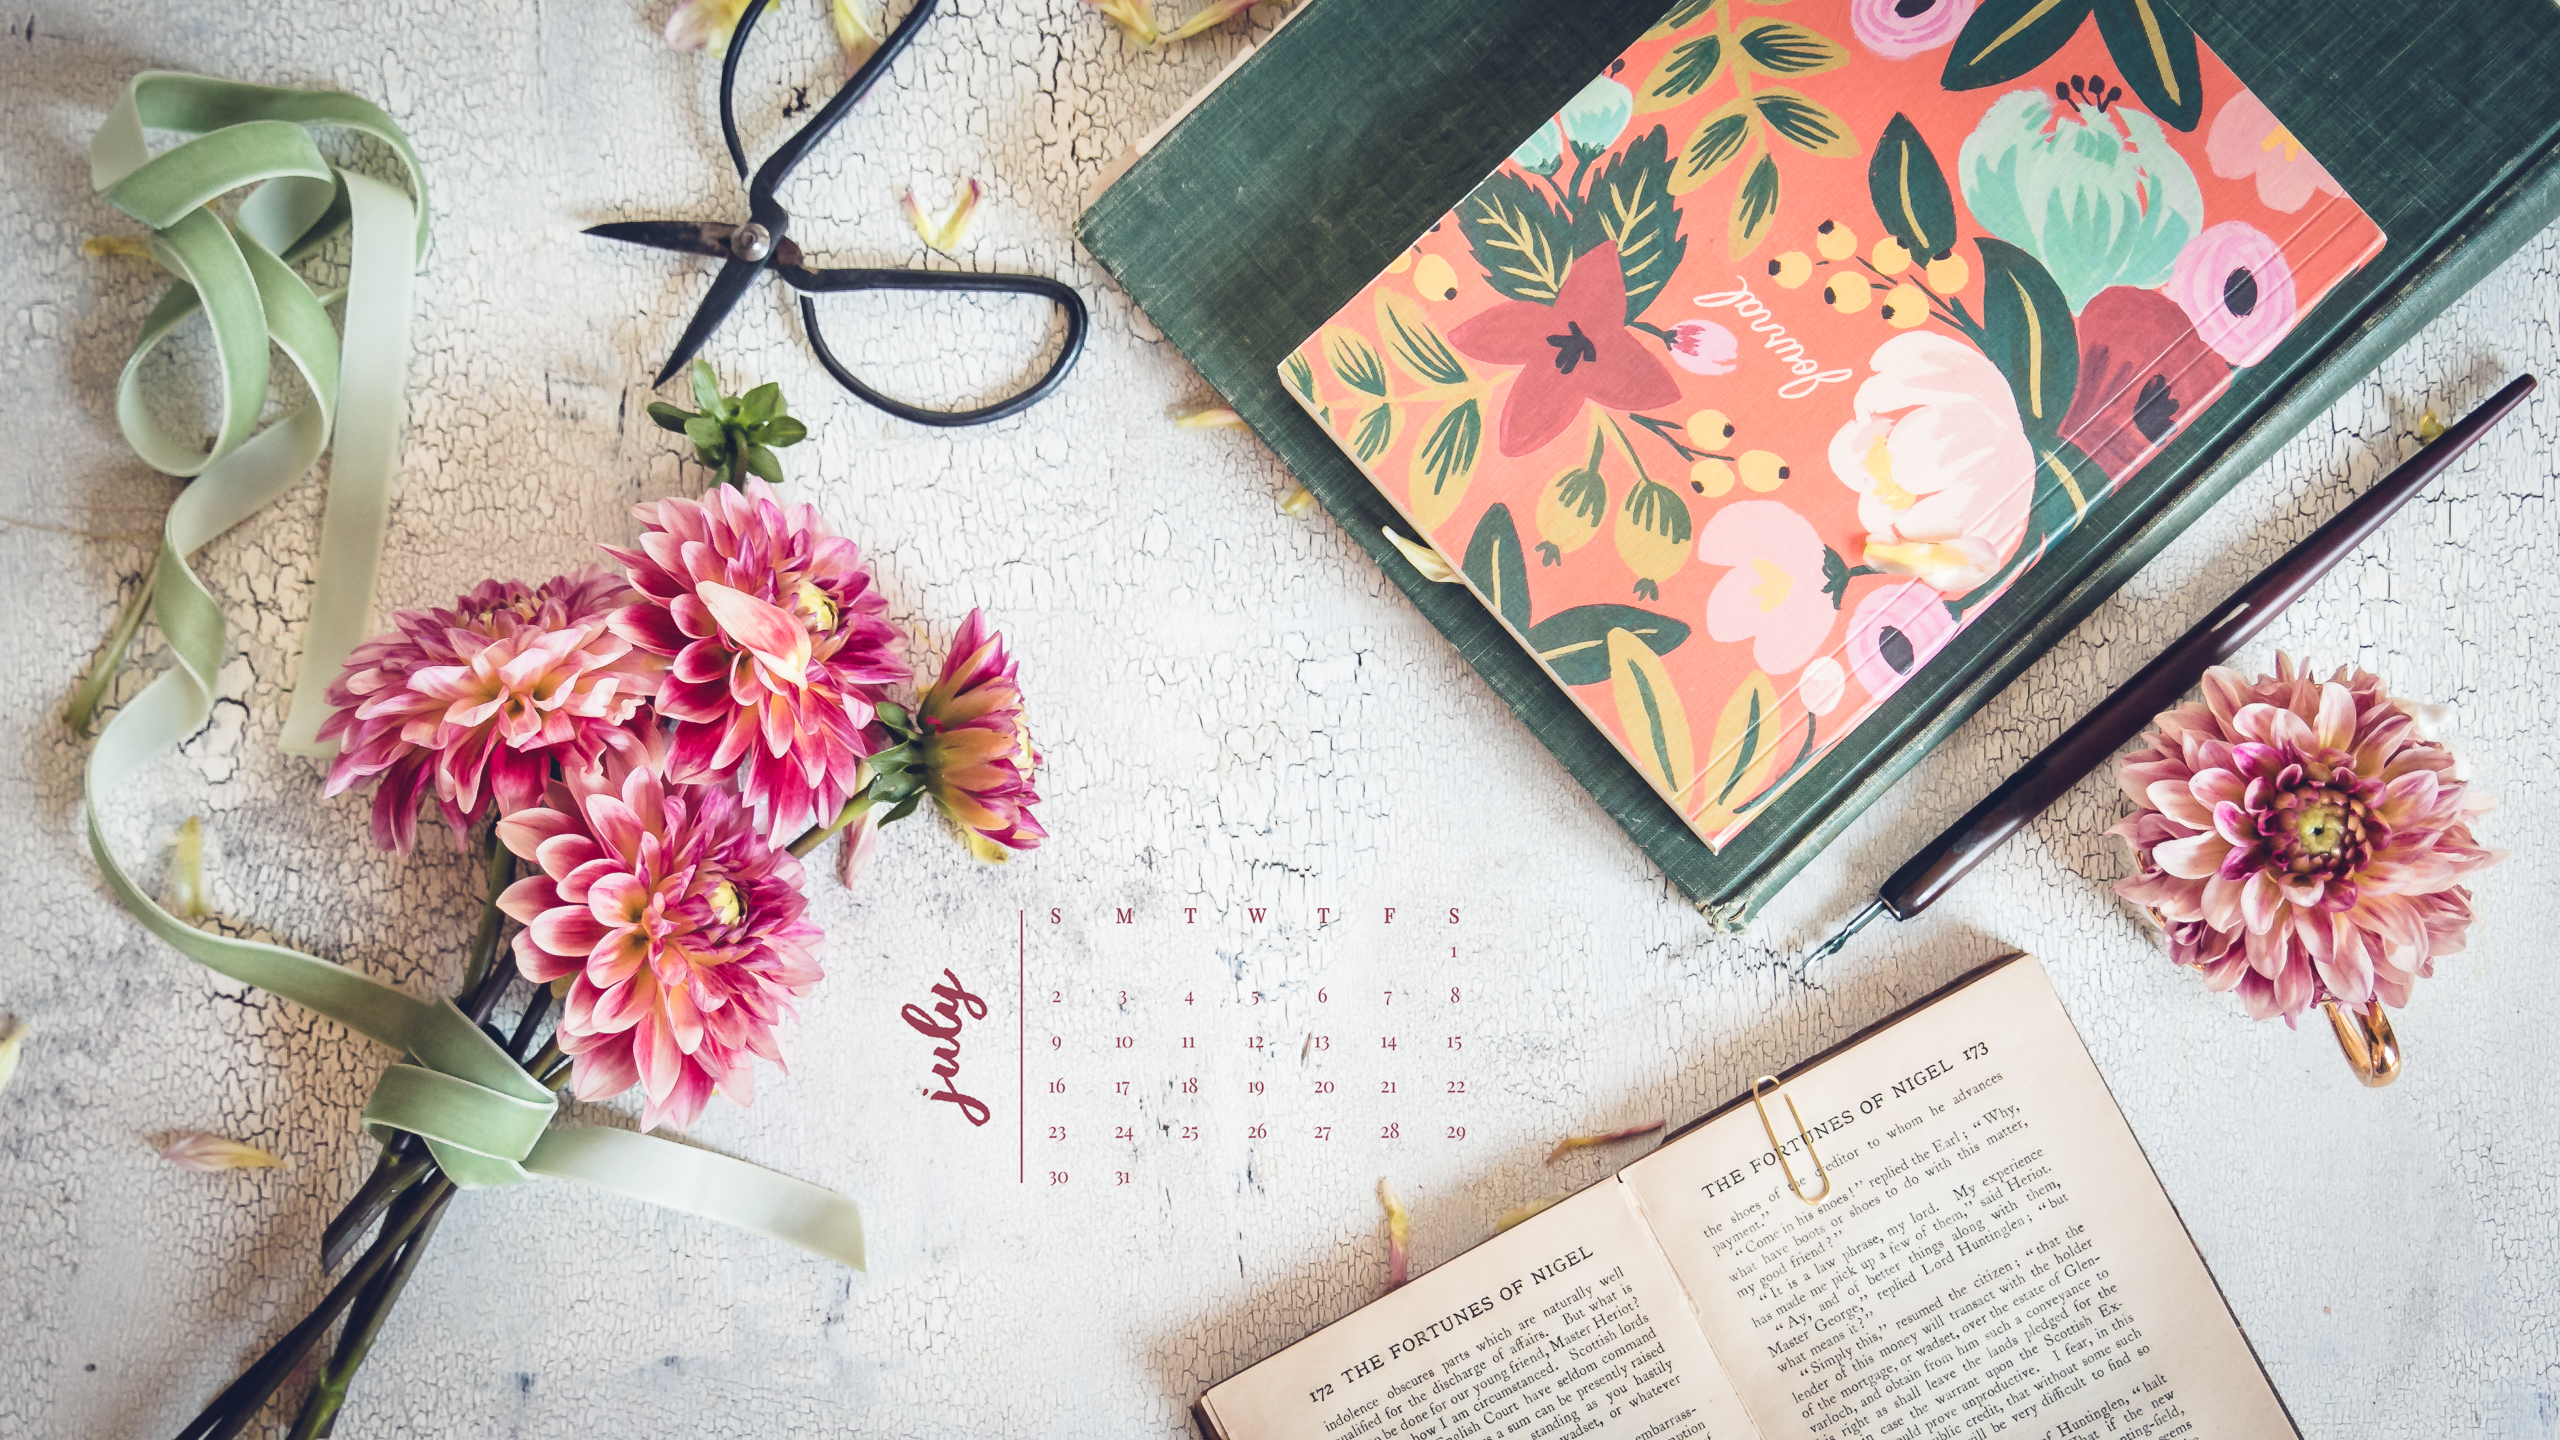 Fall Color Wallpaper For Desktop 2017 Desktop Calendars Minding My Nest